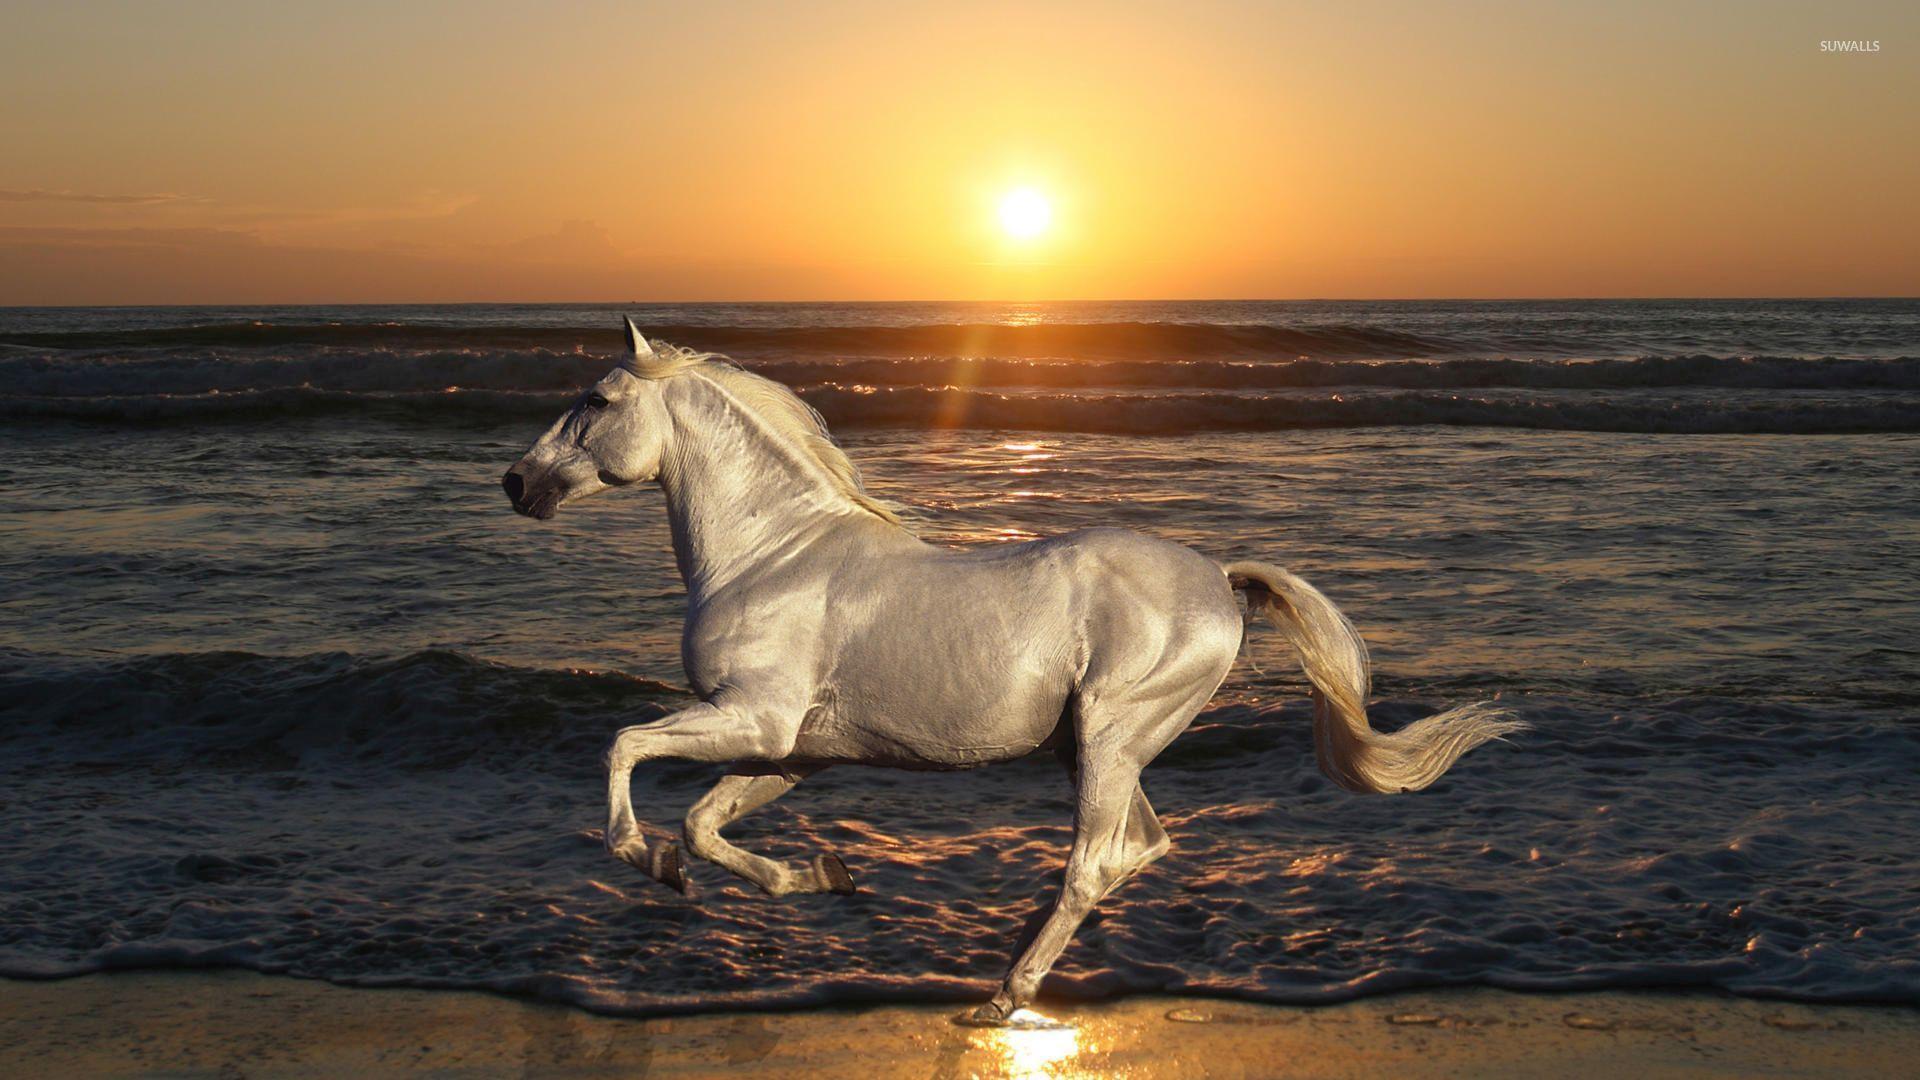 Simple Wallpaper Horse Beach - 1b1eaeb6a7496e7fb2bc336bfdb15ed9  Image_64145.jpg